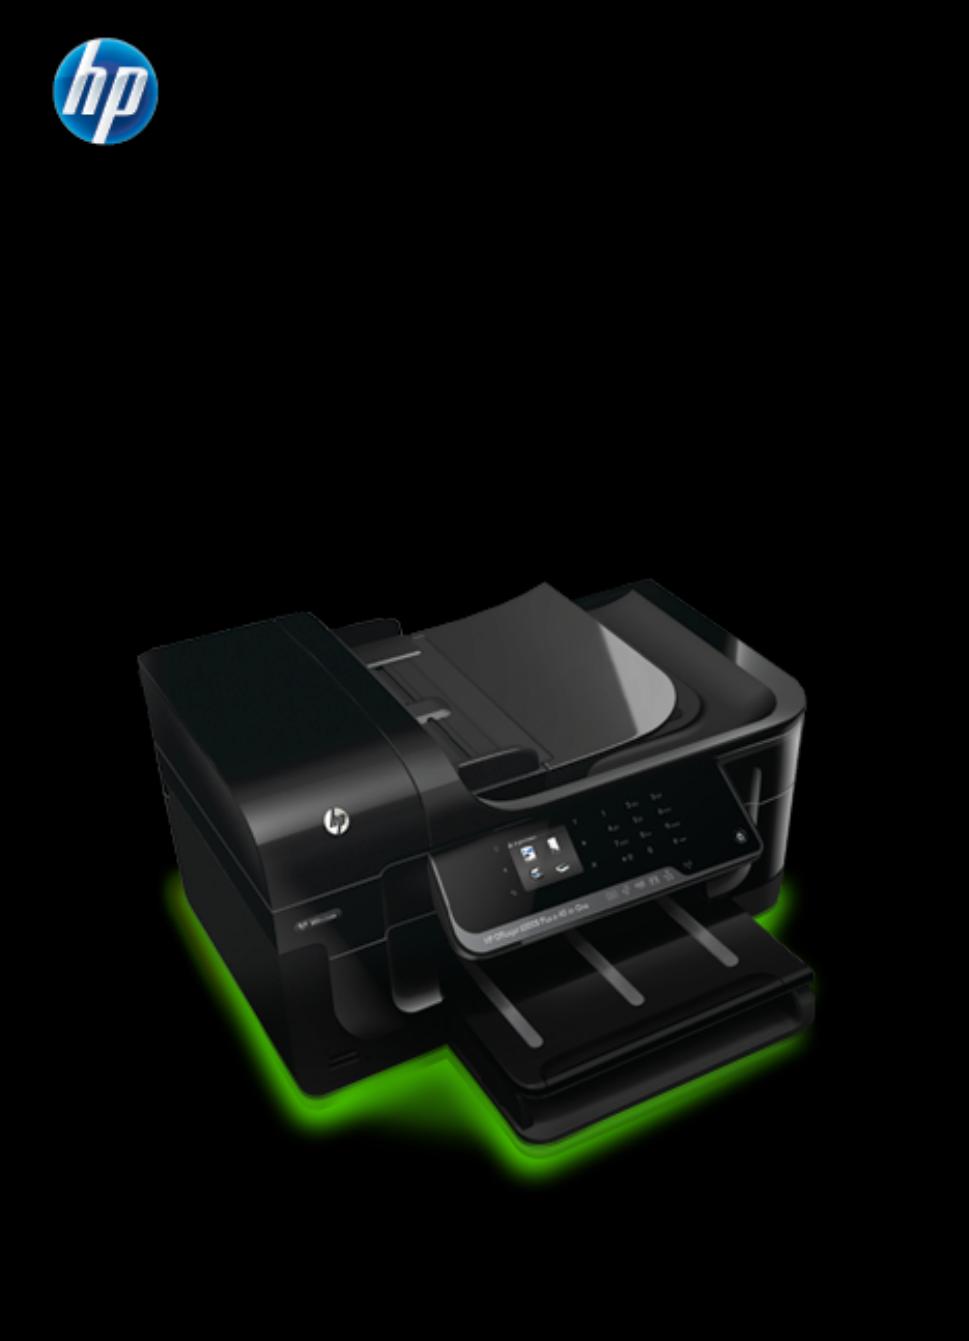 hp officejet 6500a plus e all in one printer e710n user s manual rh manualagent com hp officejet 6500a plus e710n manual HP Officejet 6500 Printer